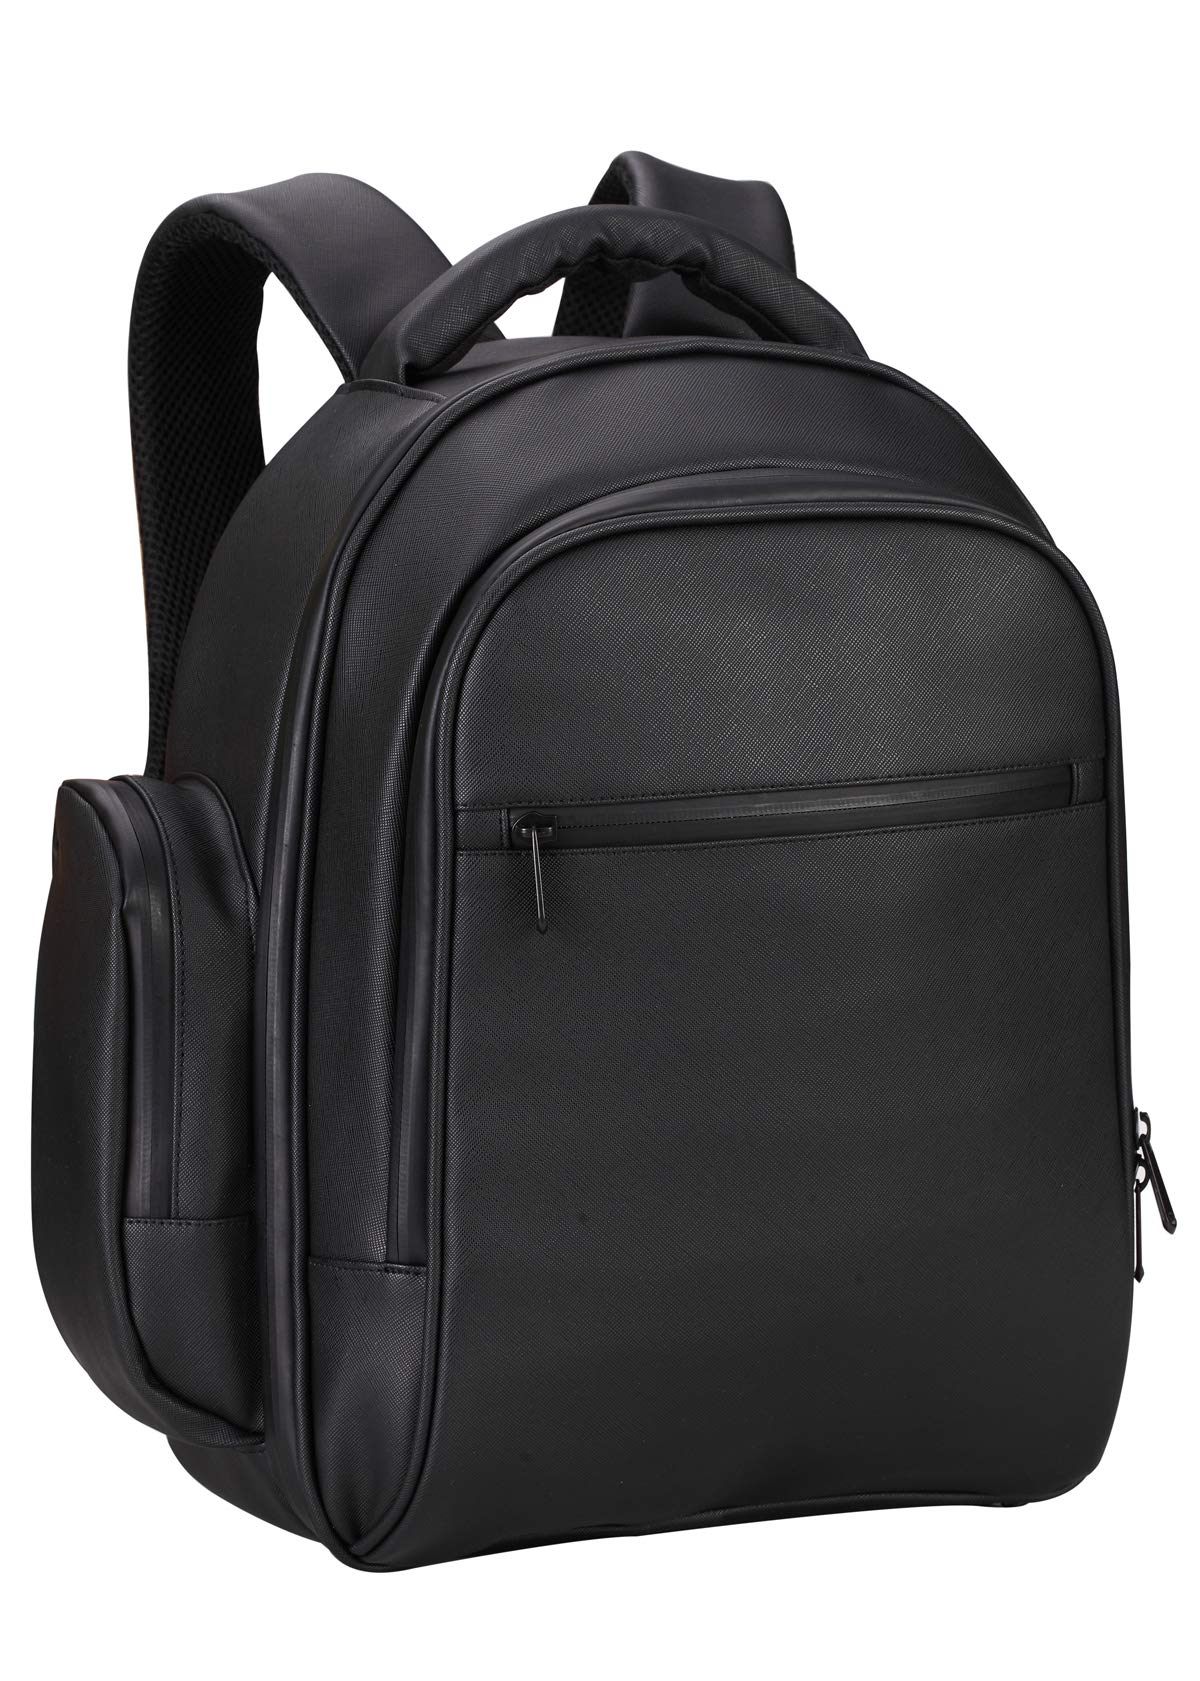 Drone Backpack Waterproof Shoulder Bag PU Leather Travel Backpack Black for DJI Mavic 2 Pro/Zoom